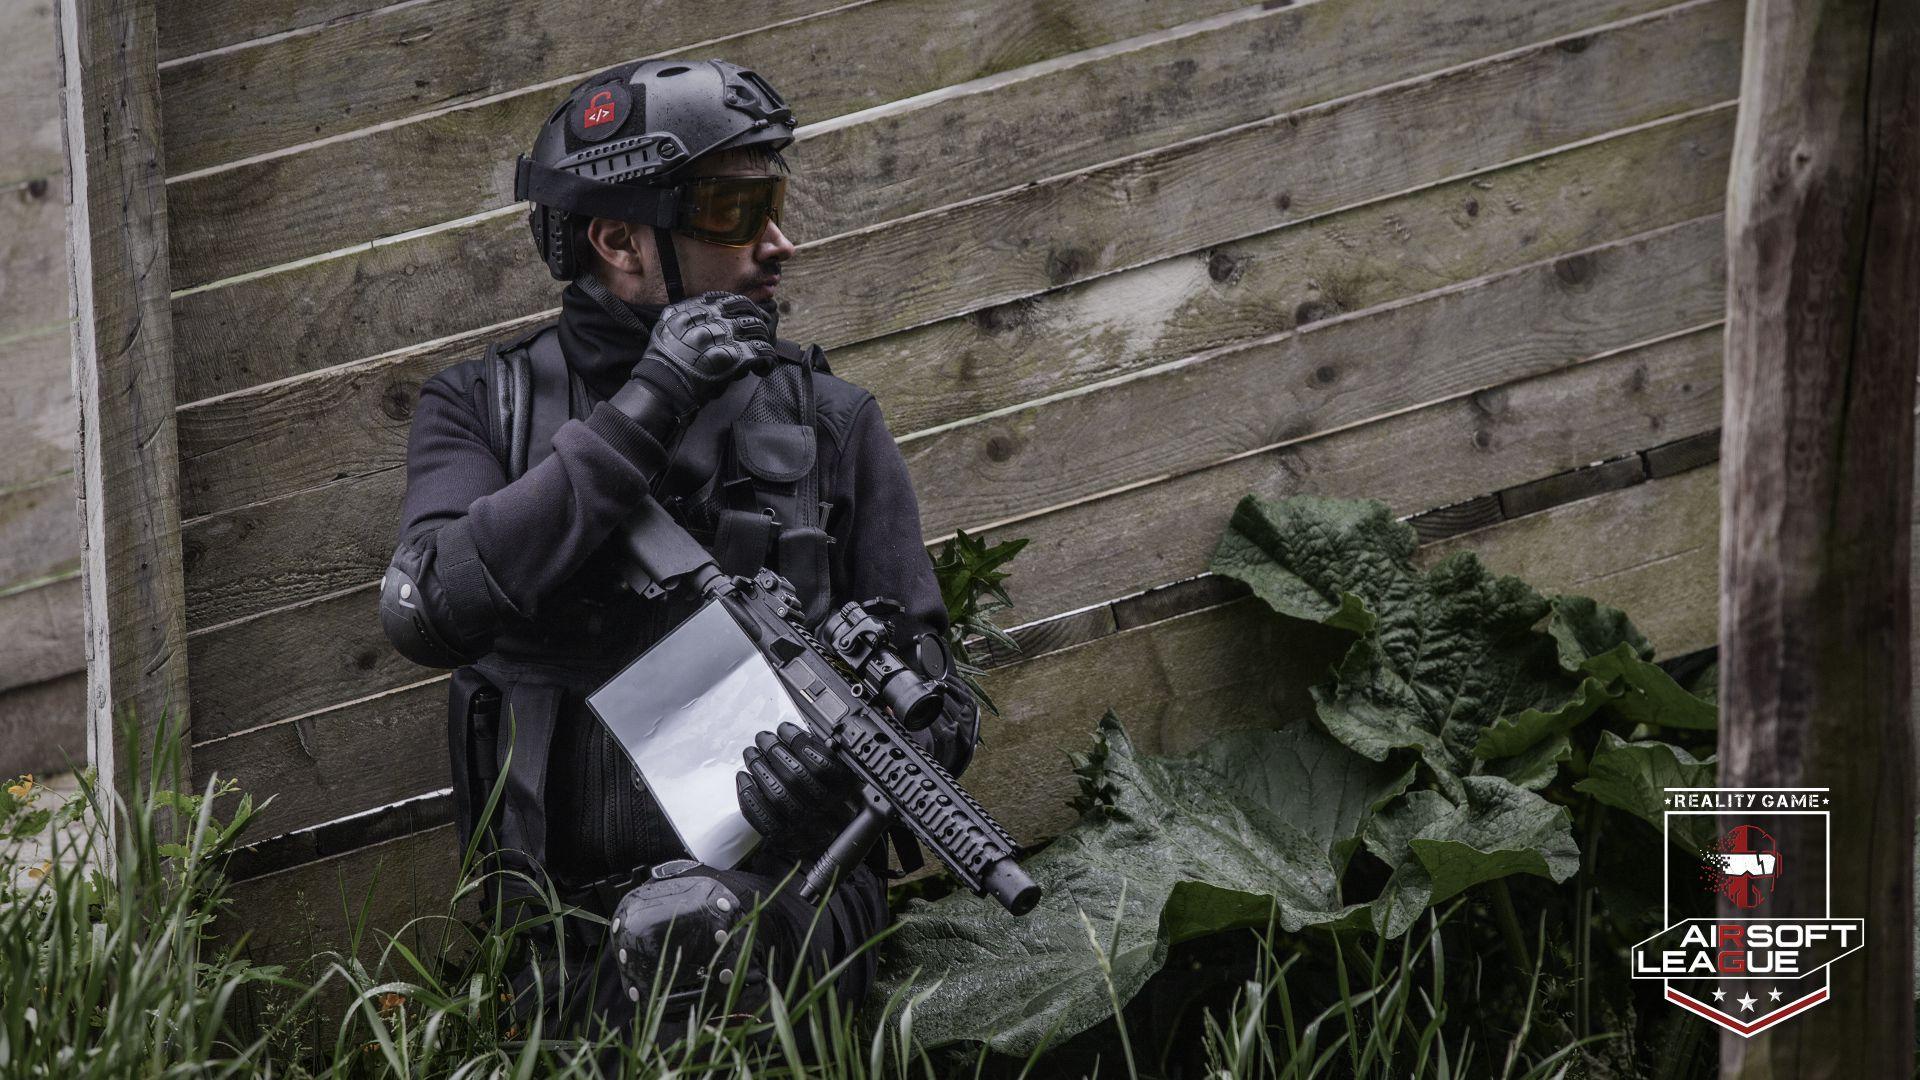 Soldat M - Police militaire